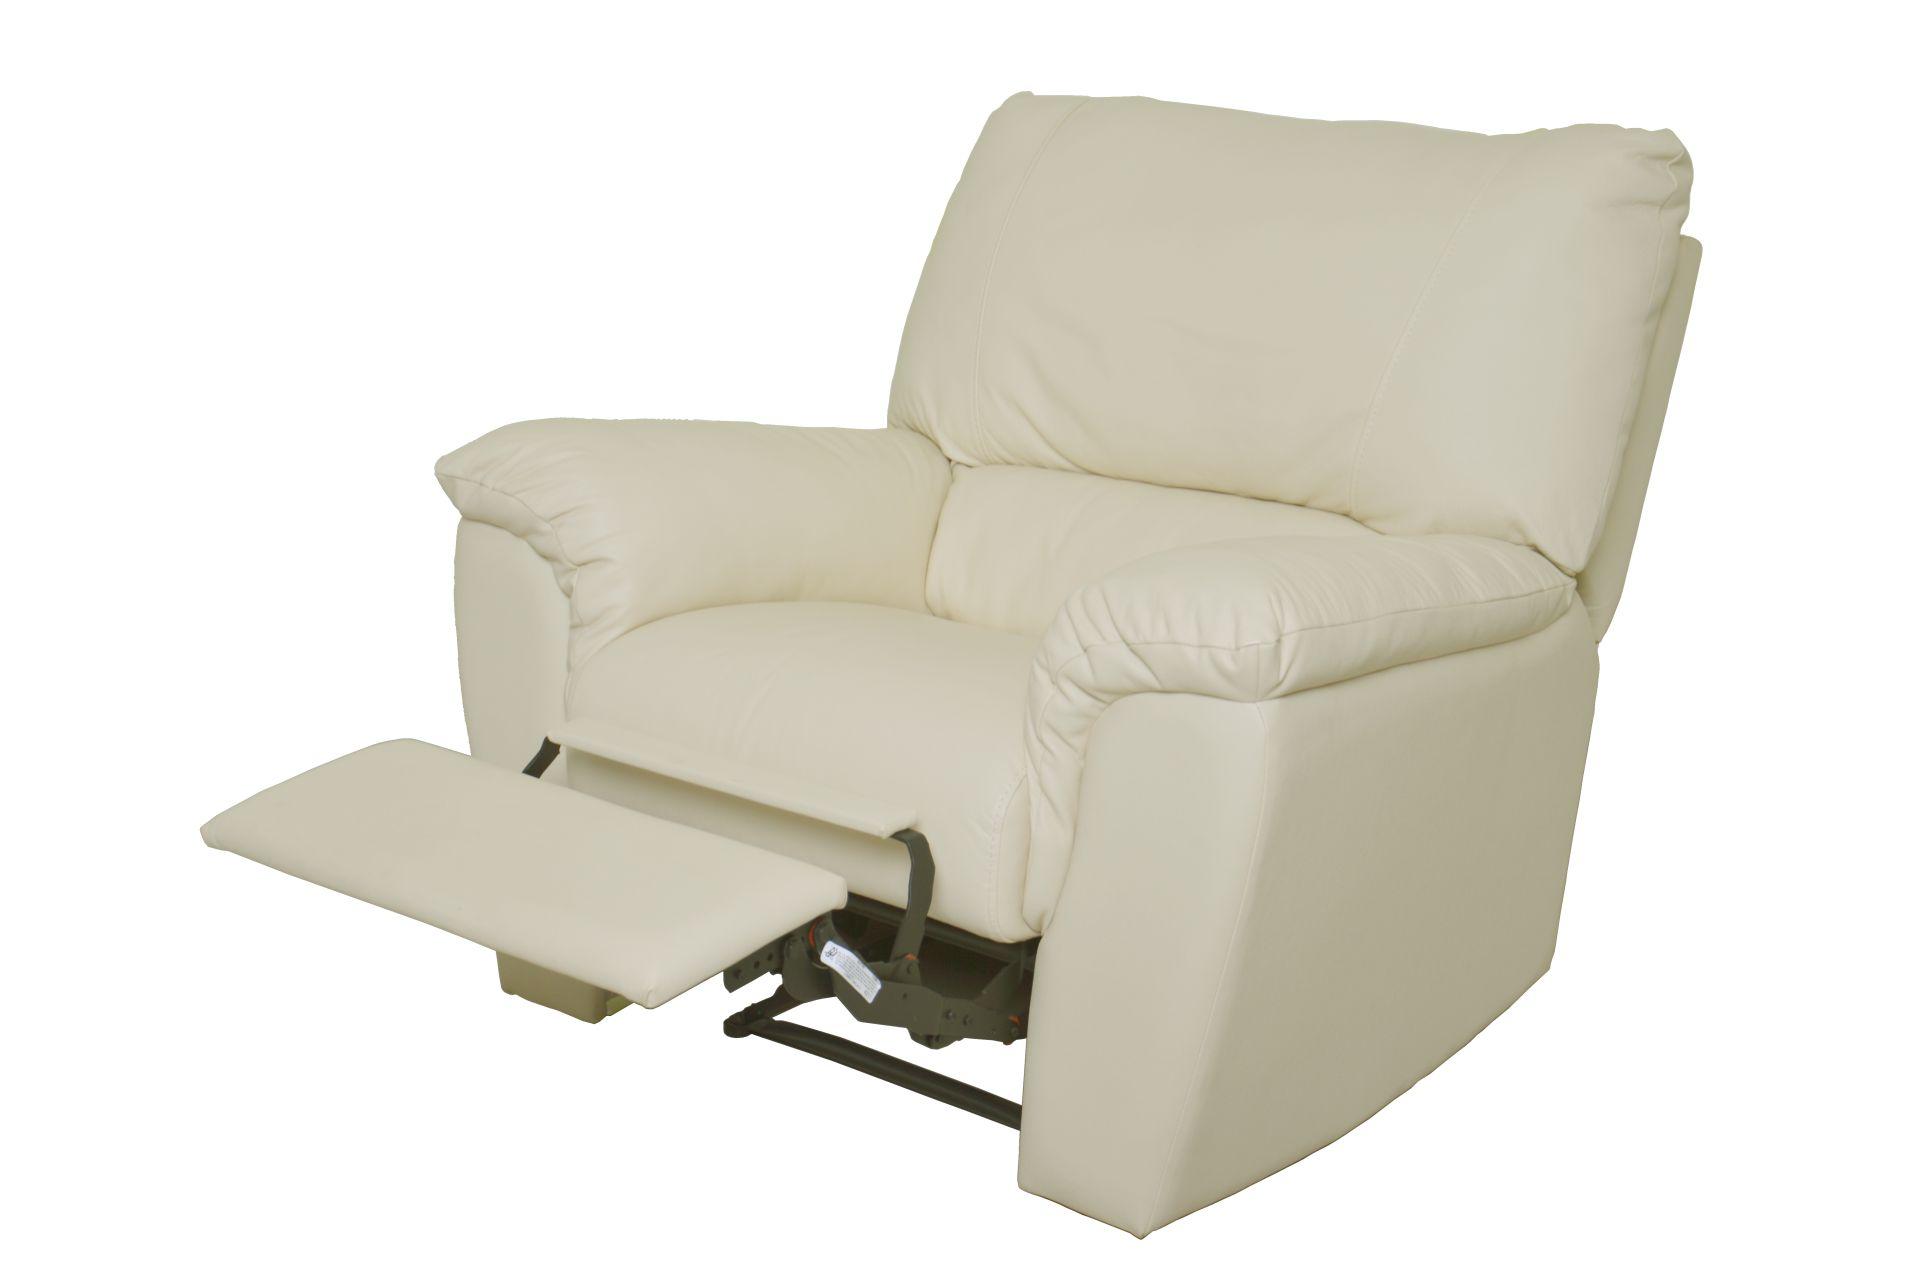 Fotel Rozkladany Meble Wanat